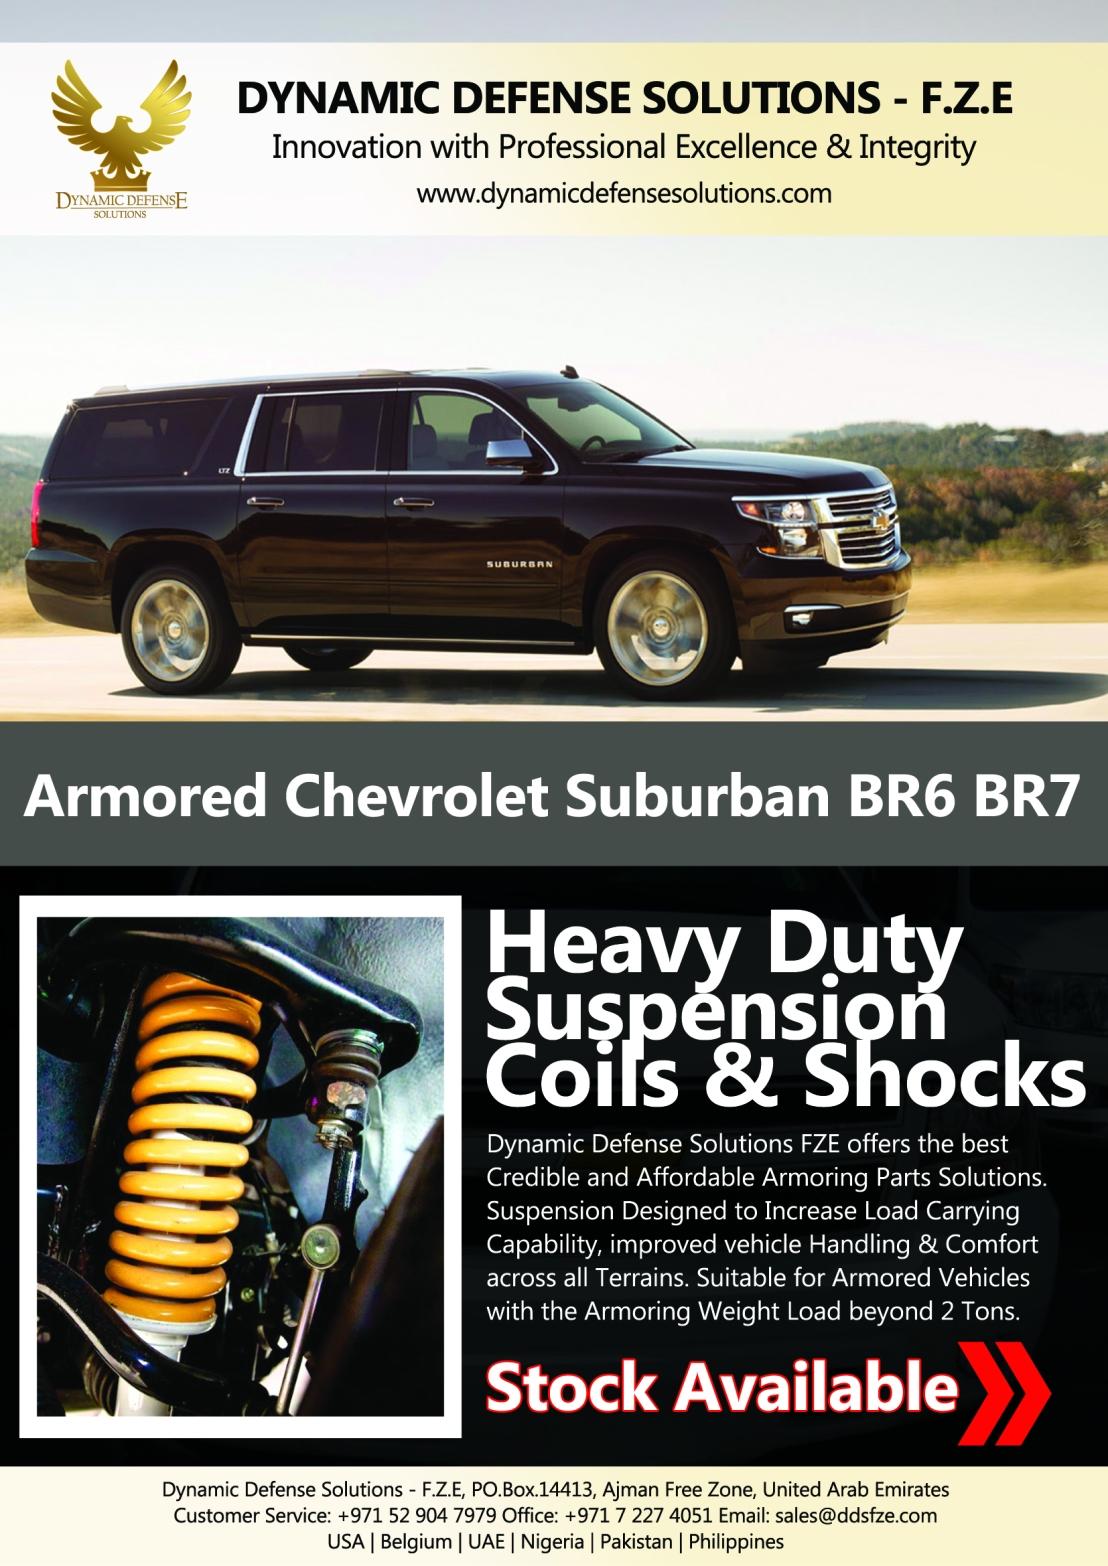 Armored Chevrolet Suburban B6 B7 Heavy Duty Suspension Shocks And